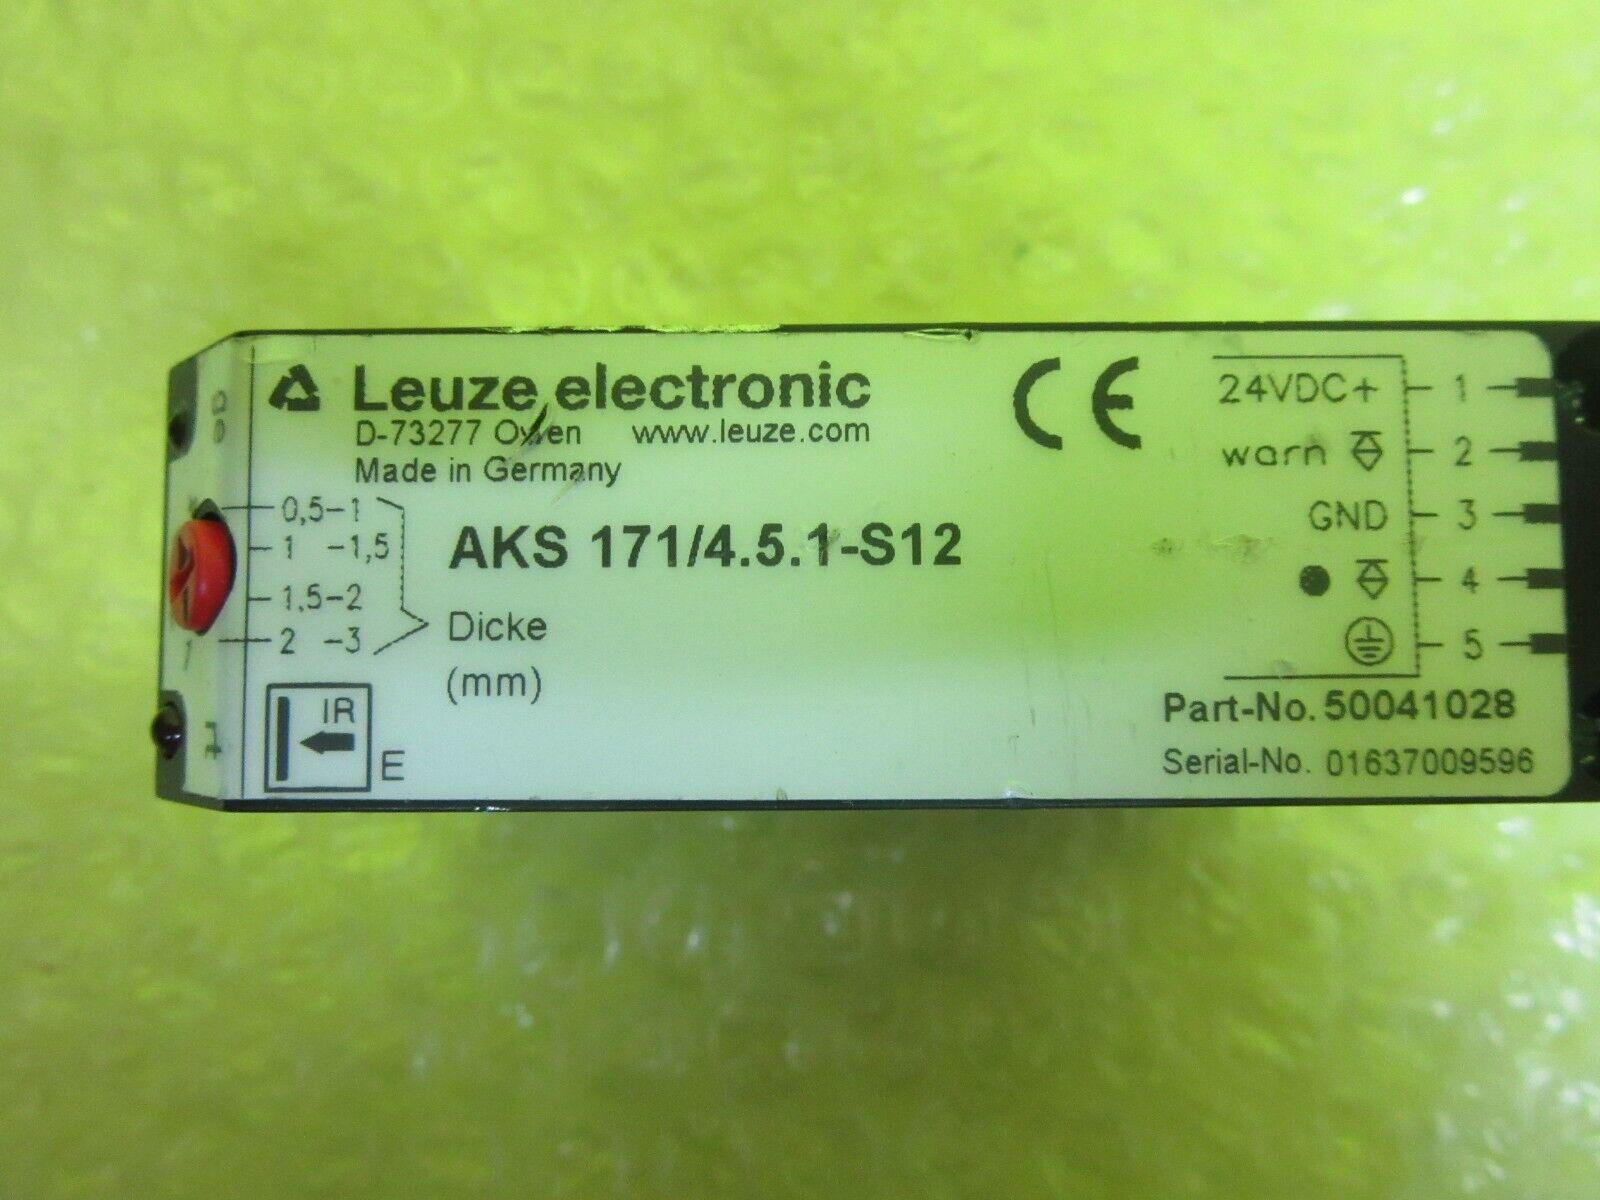 Leuze iocsc 740//6-450.01-s12 used